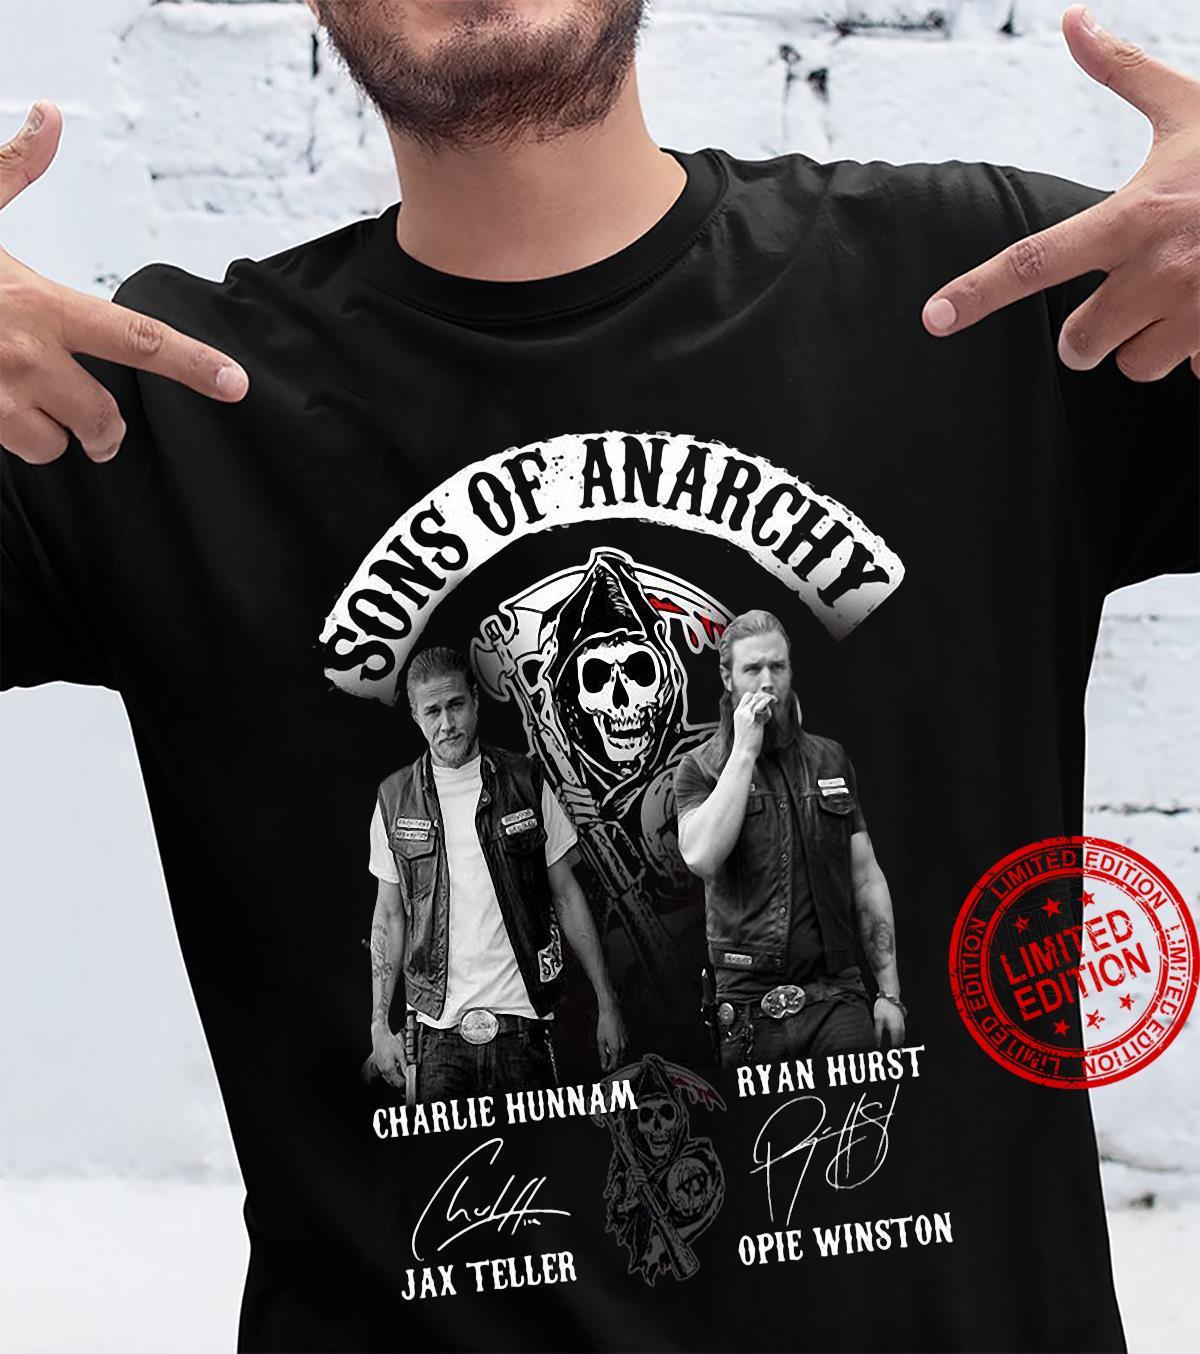 Sons Of Anarchy Charlie Hunnam Jax Teller Ryan Hurst Opie Winston Shirt